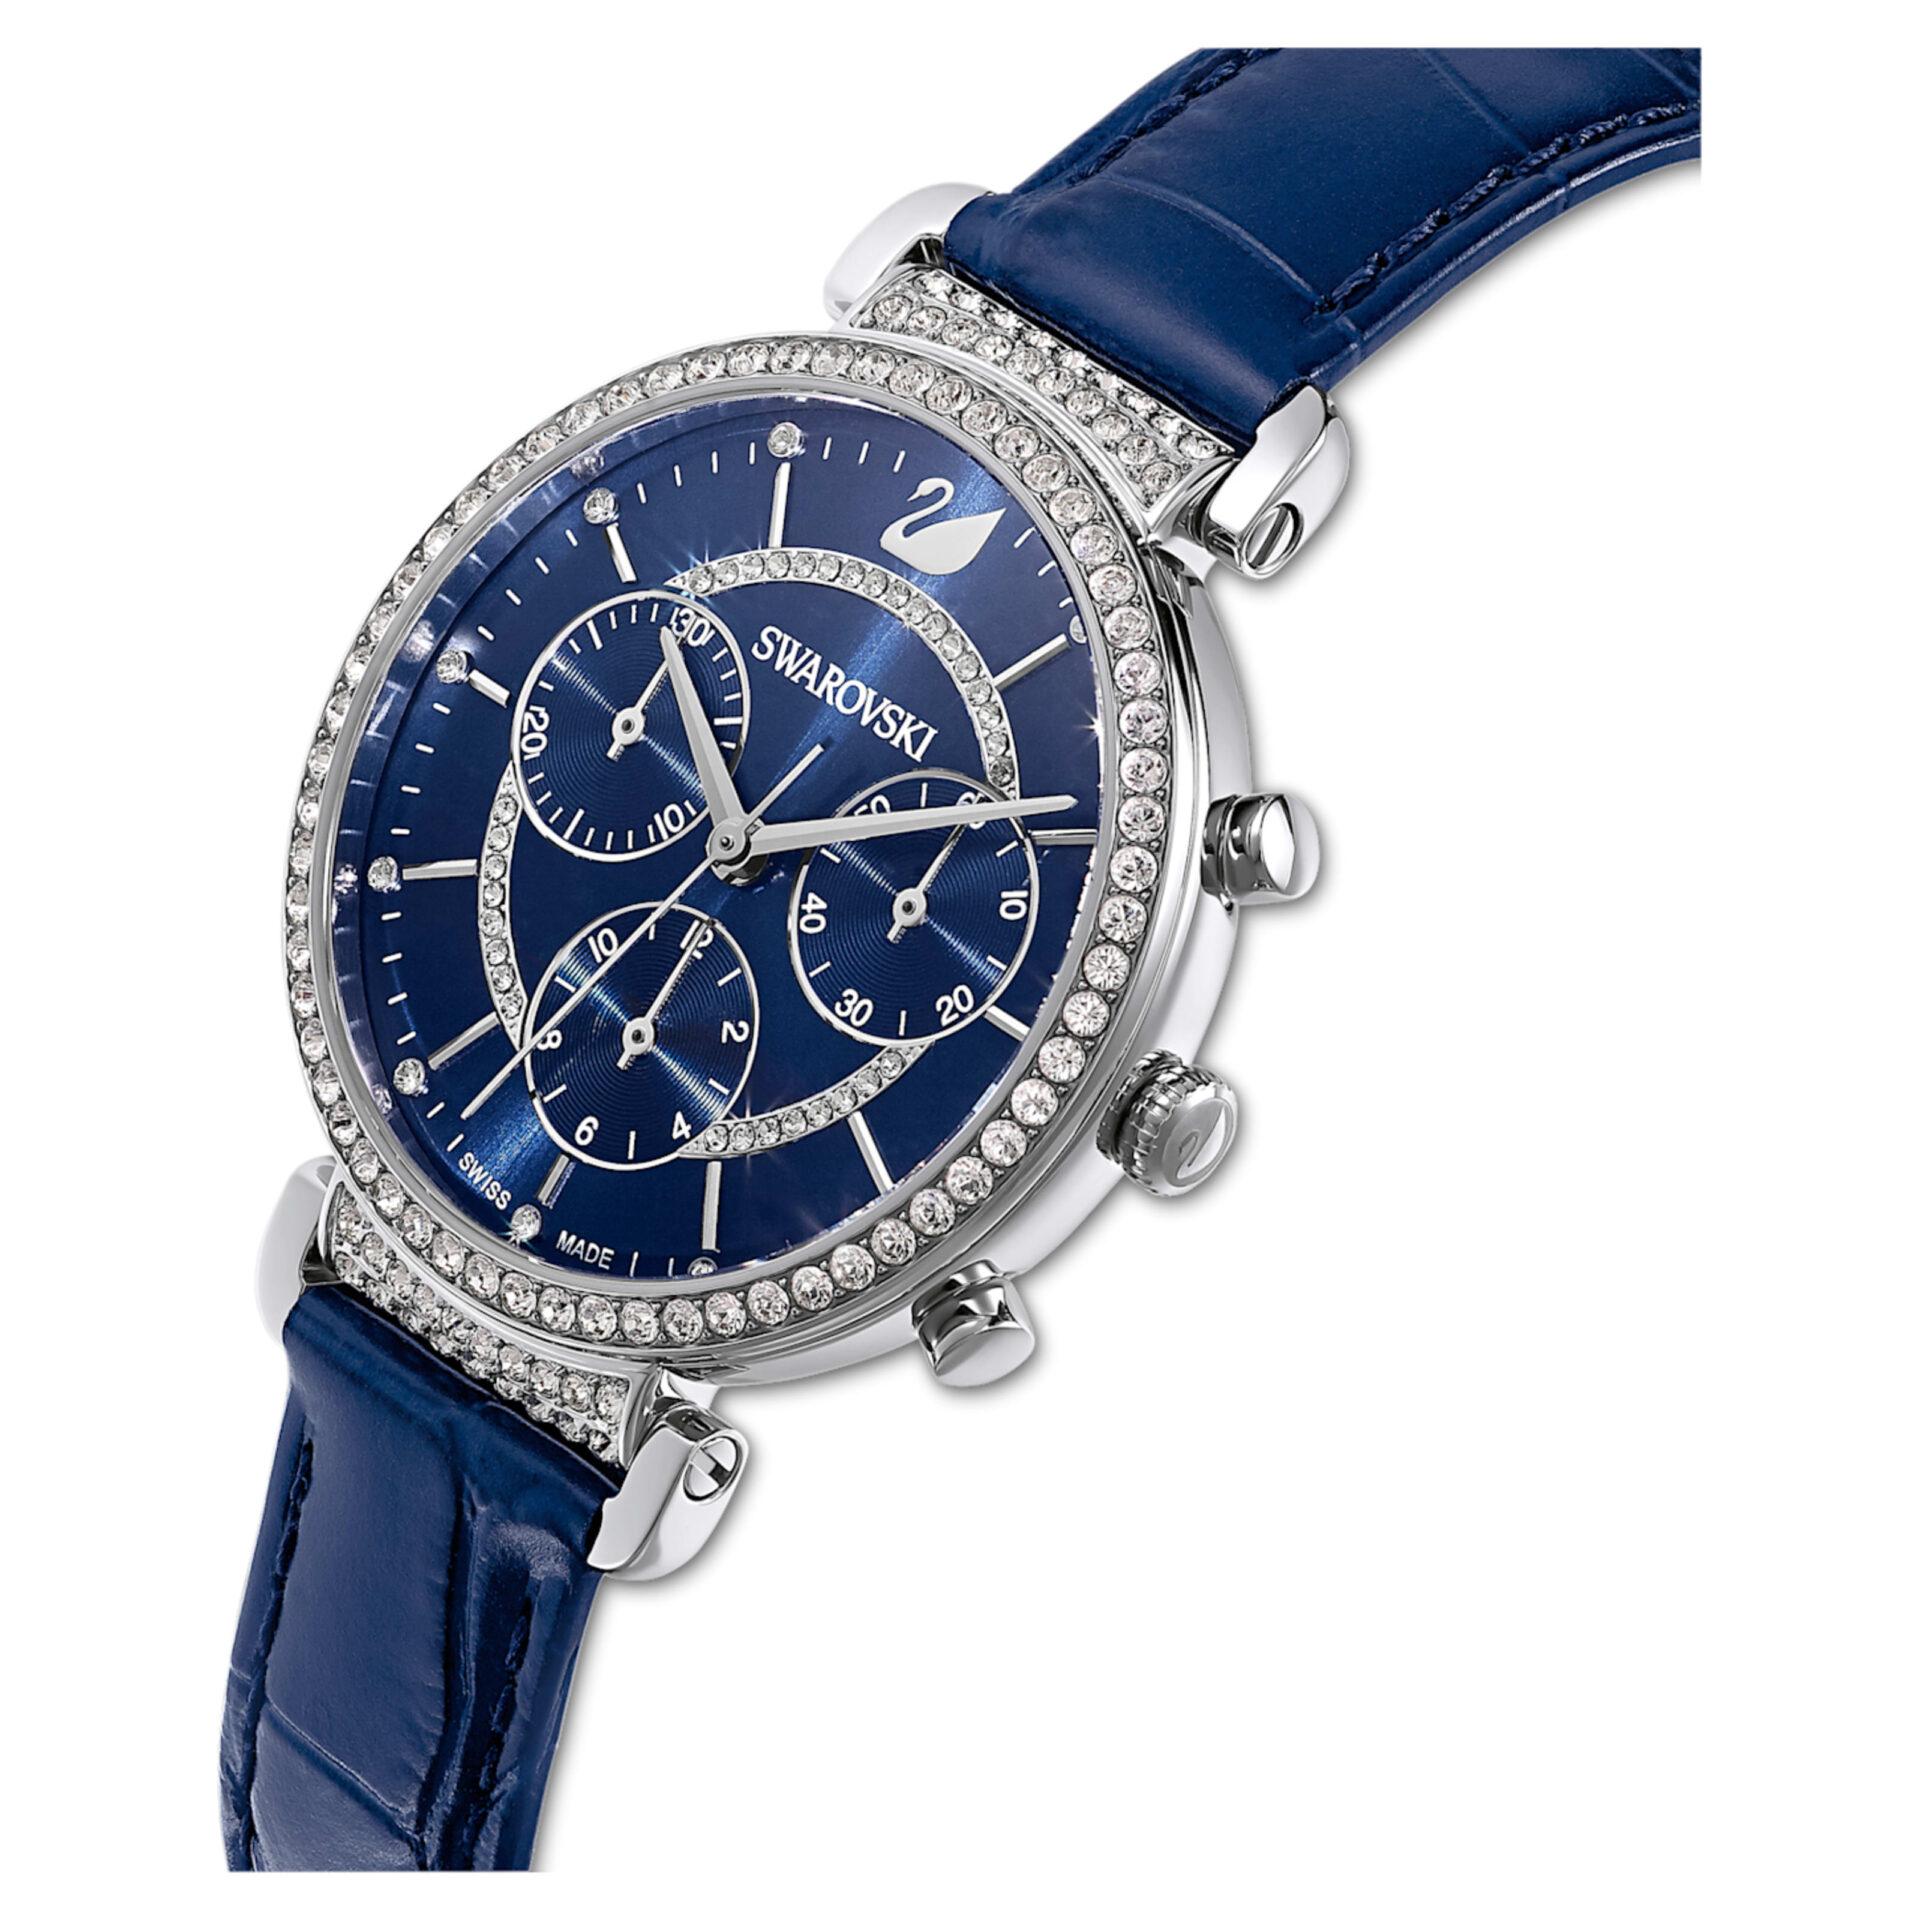 Montre Passage Chrono, bracelet en cuir, bleu, acier inoxydable, Swarovski